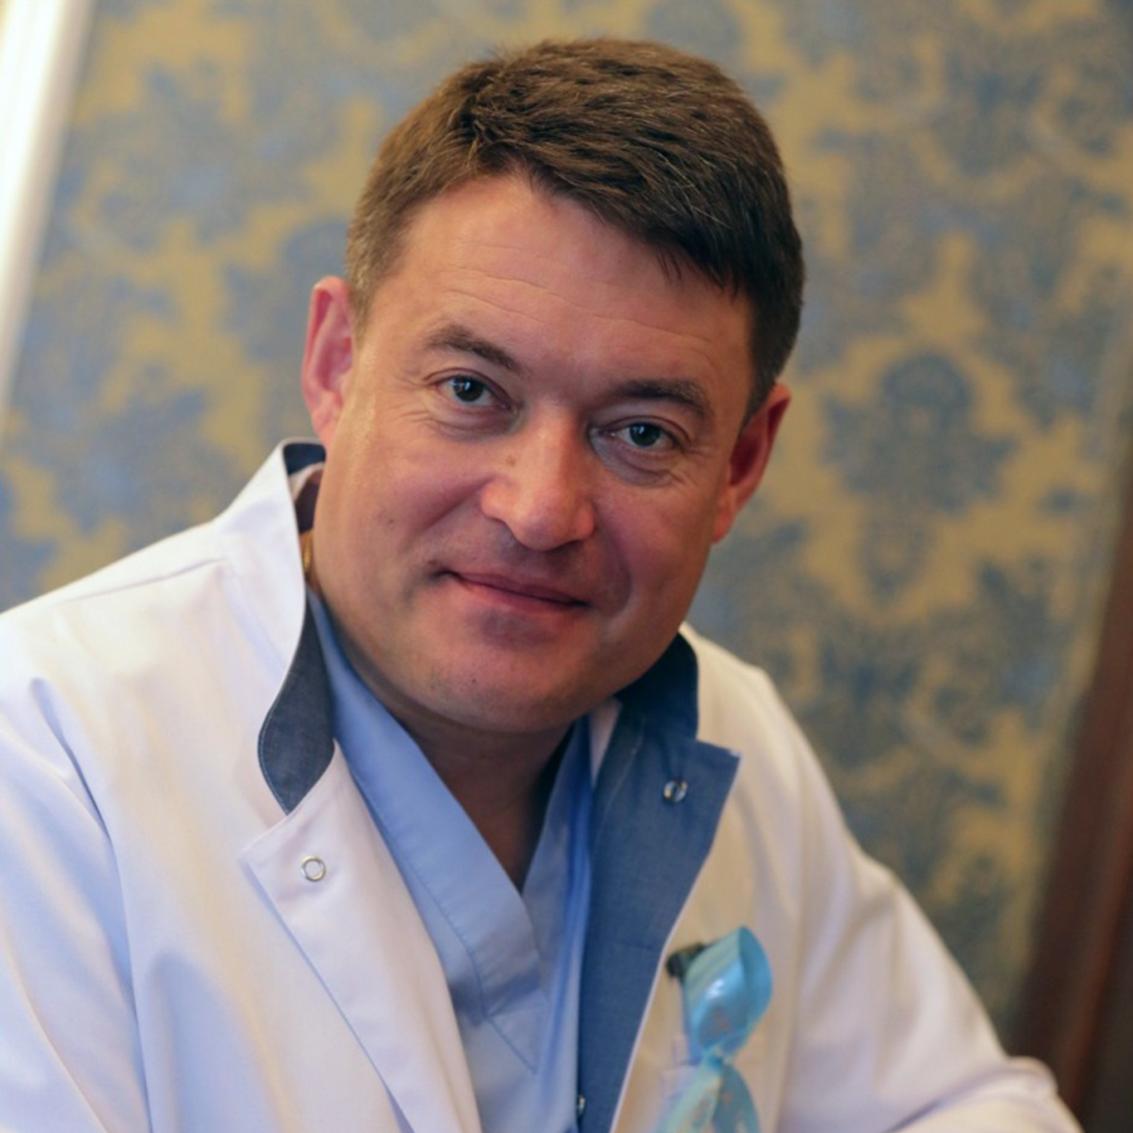 На приеме у русского доктора